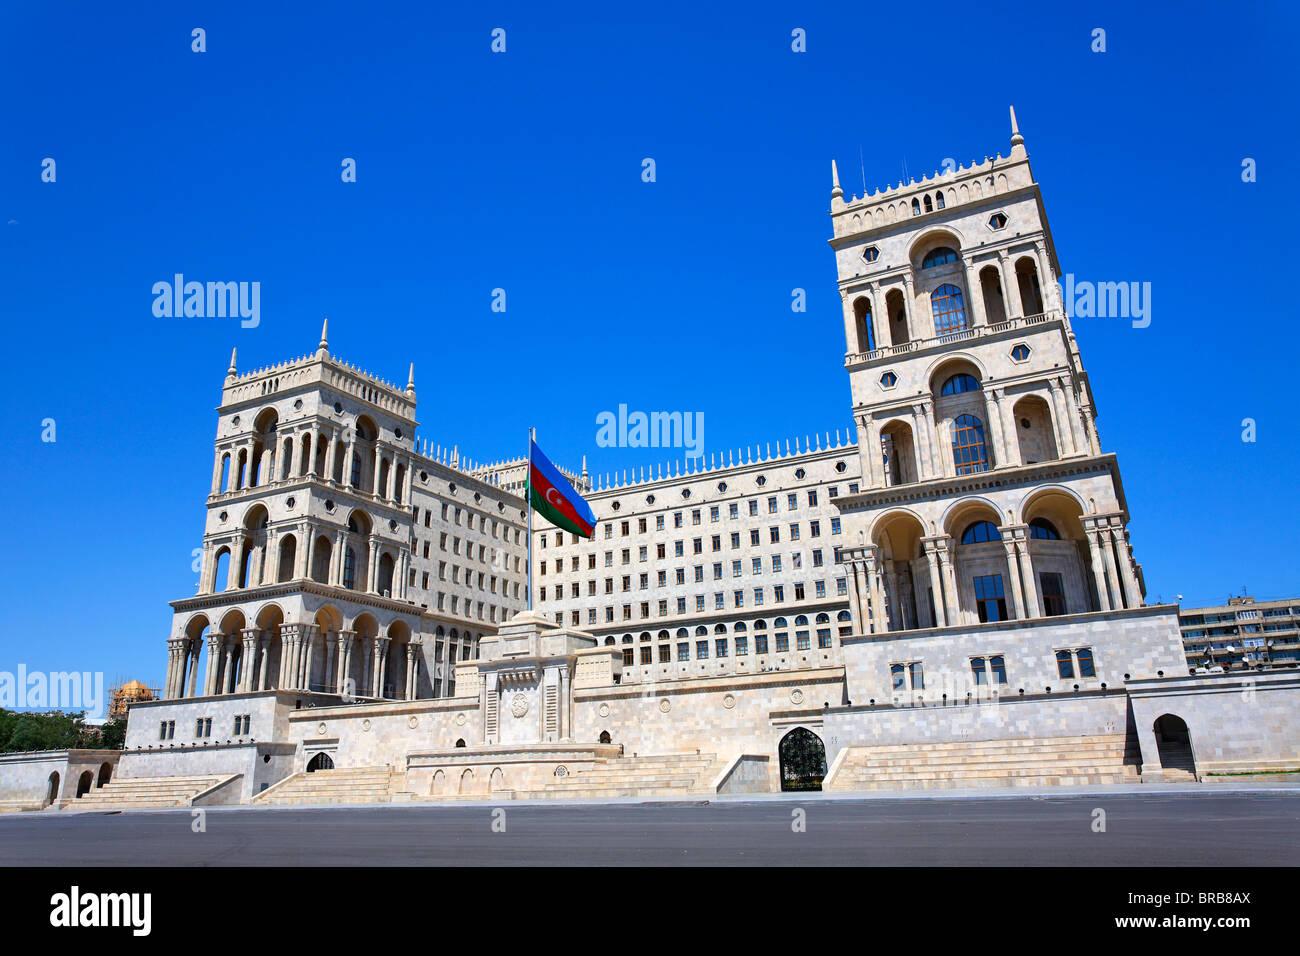 Dom Soviet, the building from which Azerbaijan was governed during the Soviet era, Baku, Azerbaijan - Stock Image